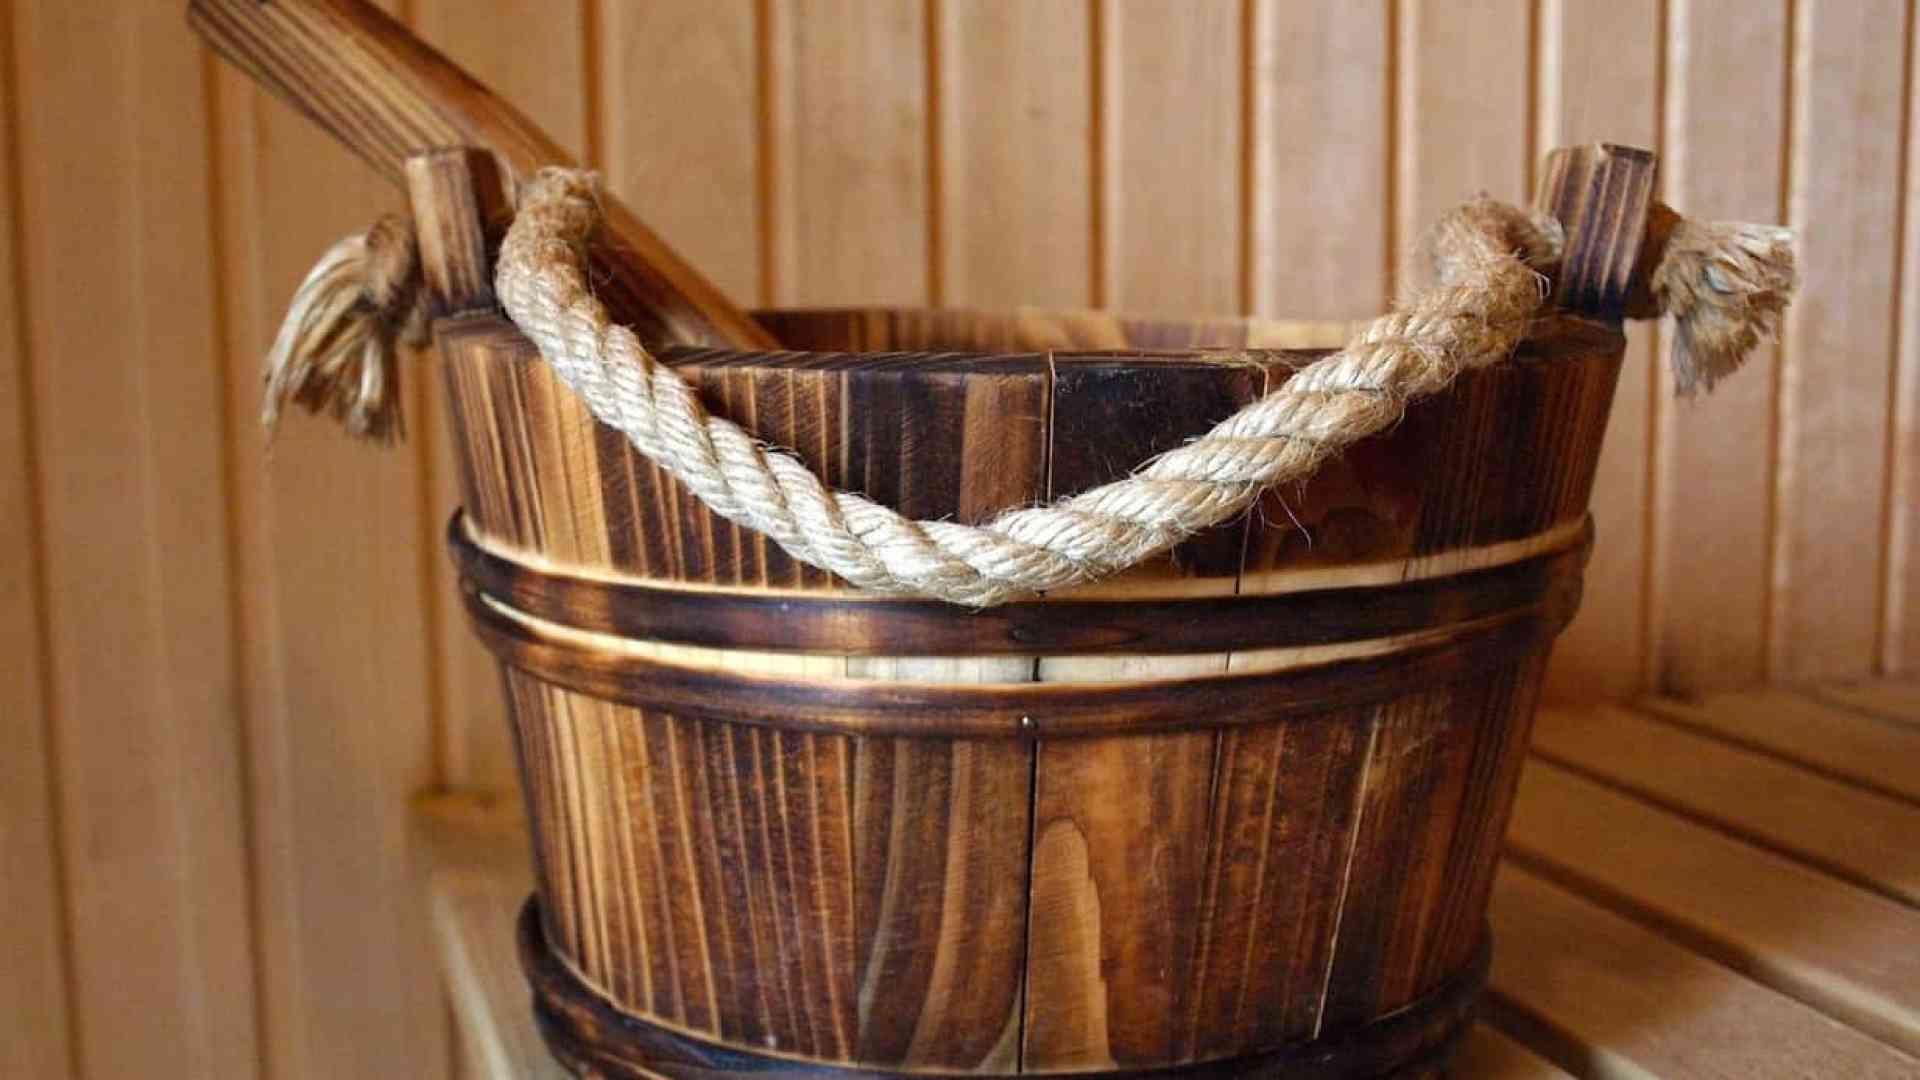 The 411 on Saunas and Sauna Benefits